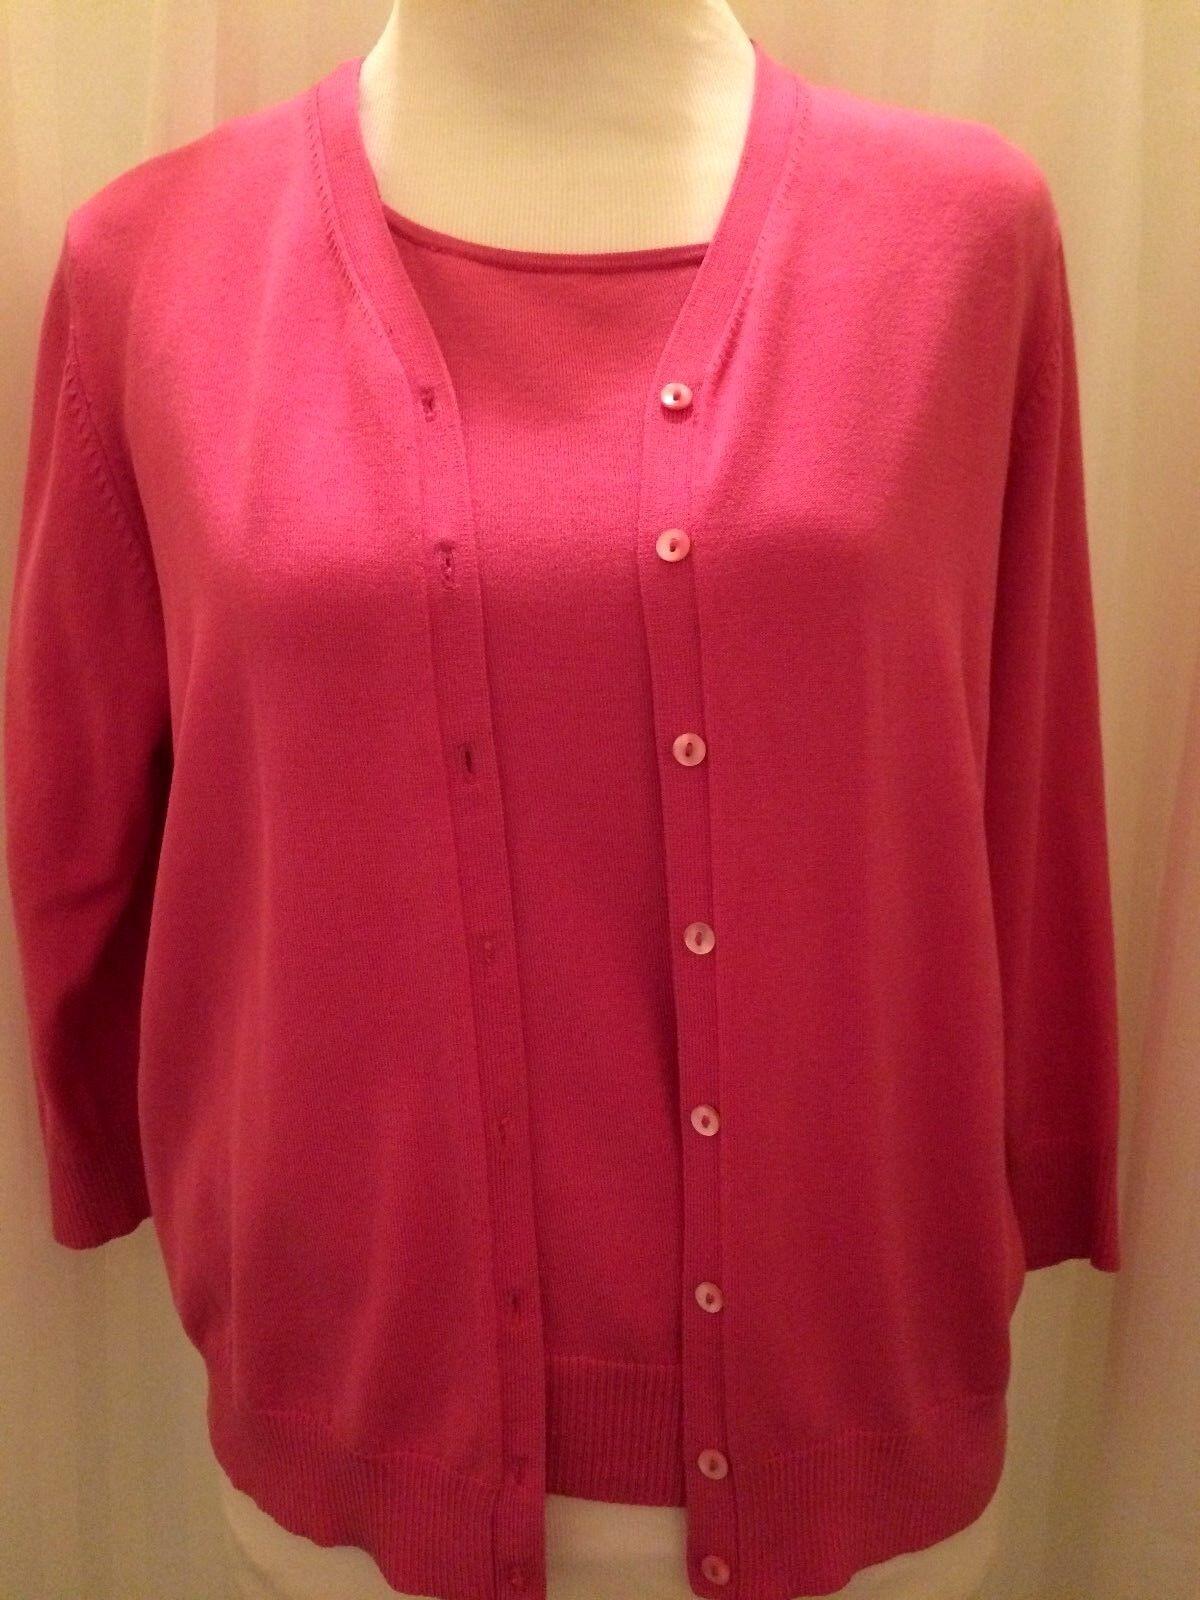 LIZ CLAIBORNE COLLECTION Petite Bright Pink 3 4 Sleeve Sweater Set Womens Sz M